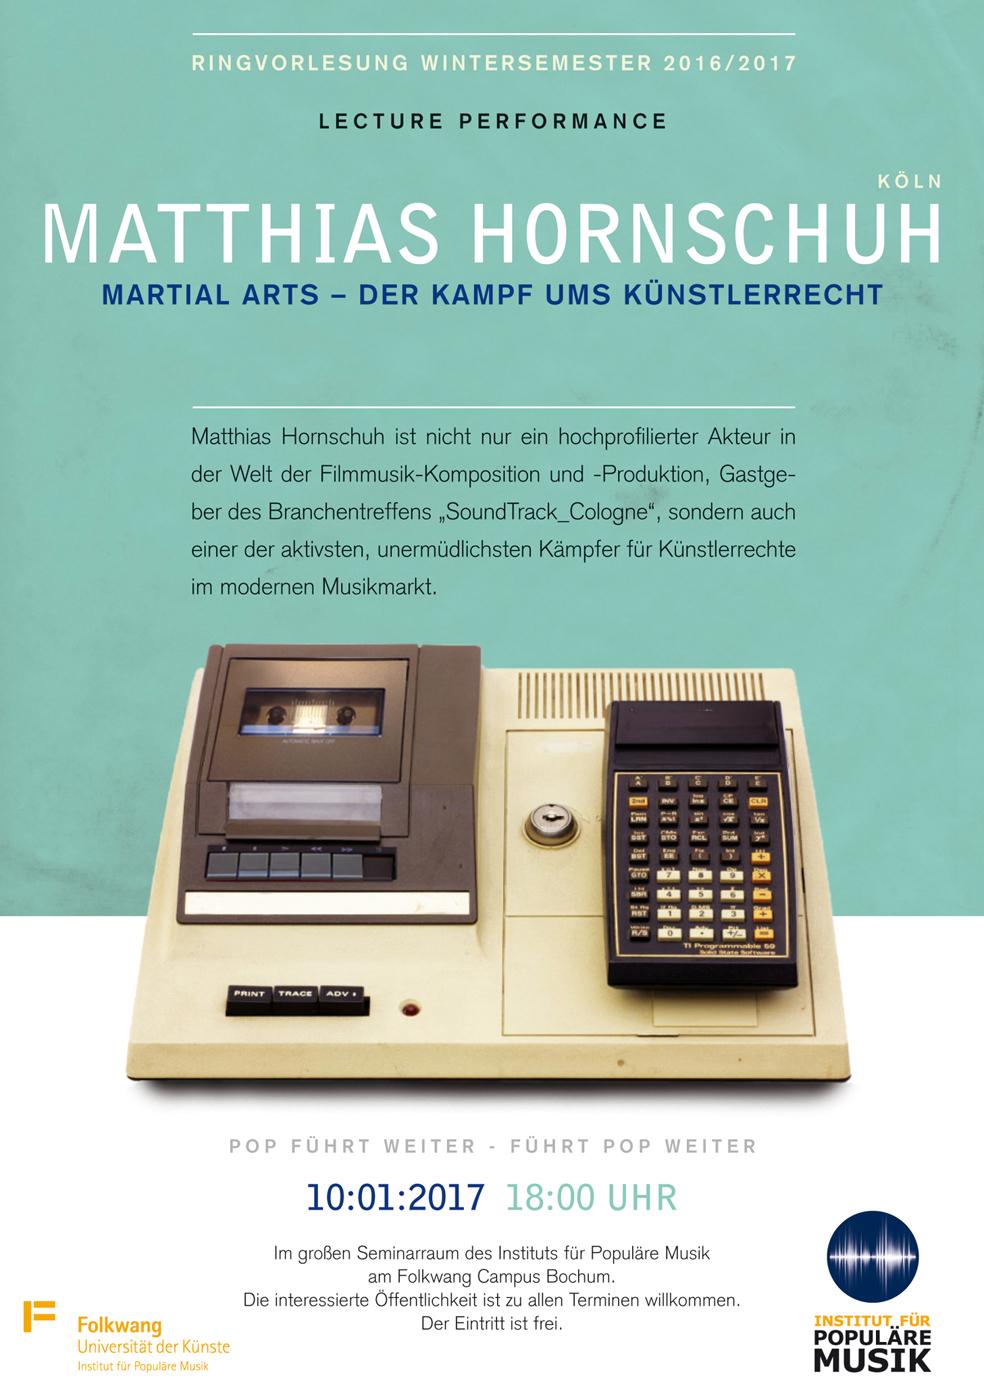 Matthias Hornschuh